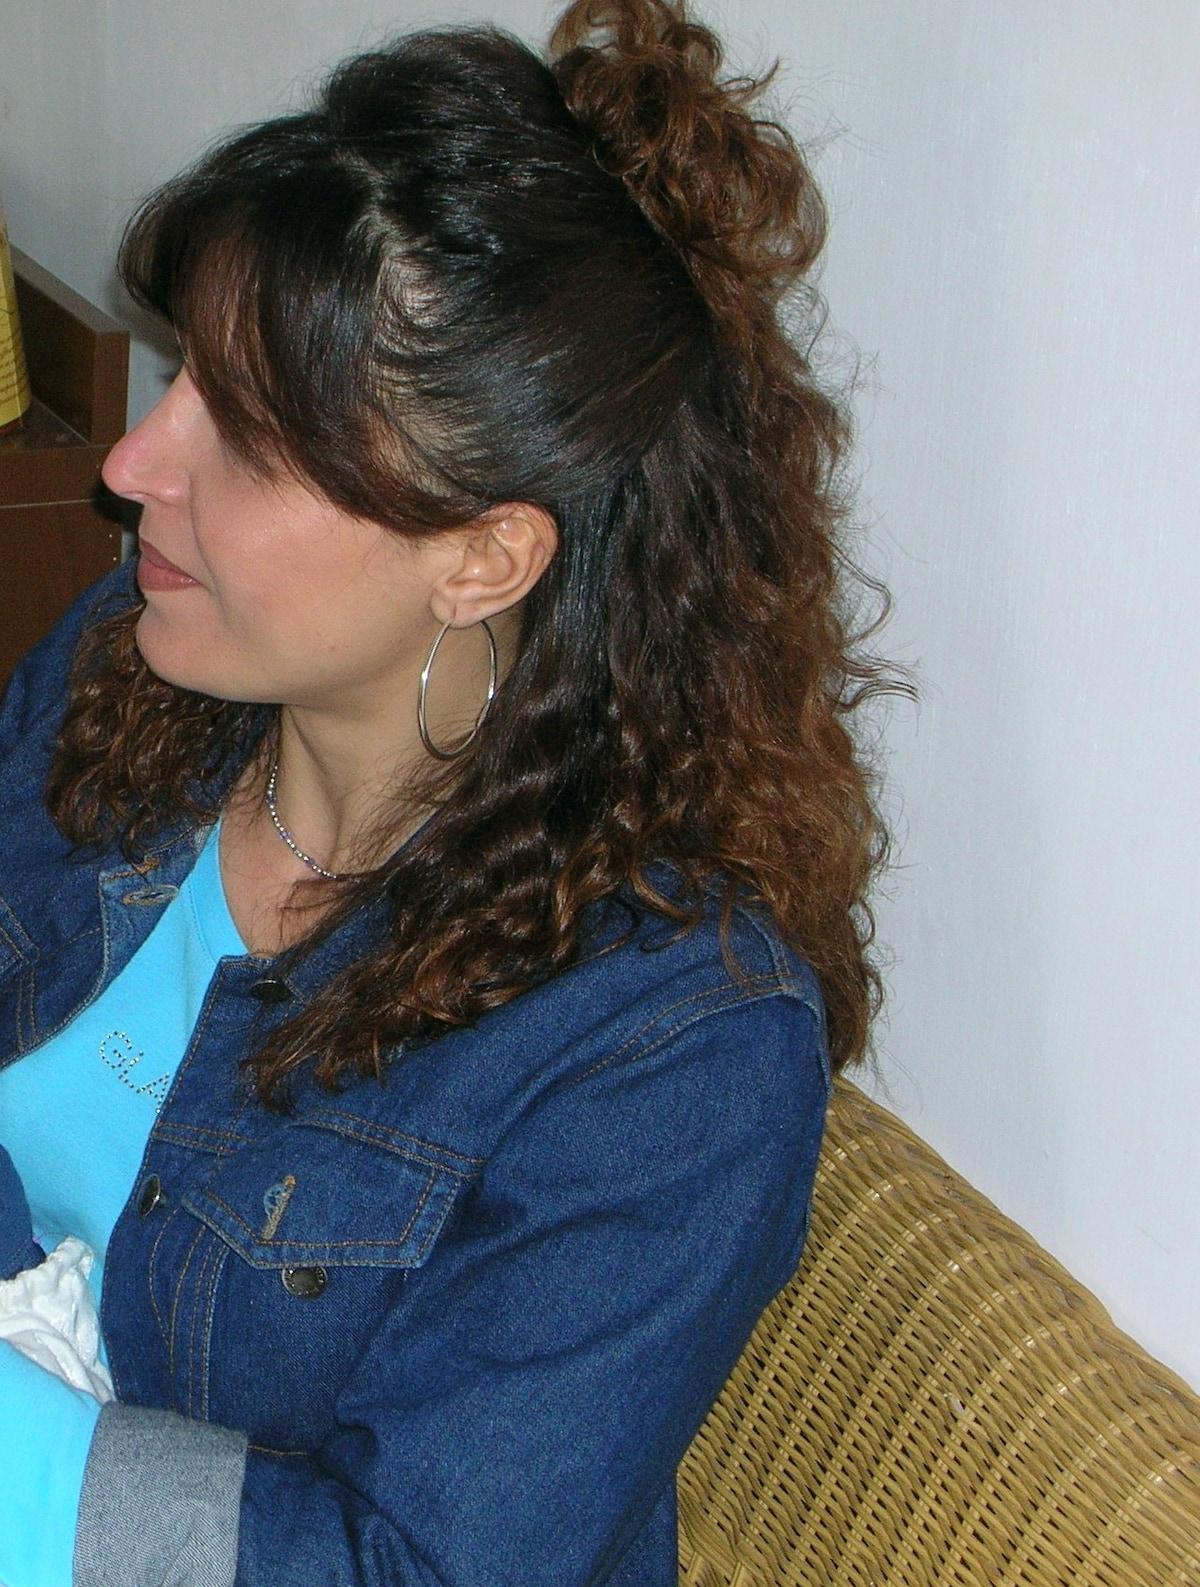 Rosalba From Salve, Italy